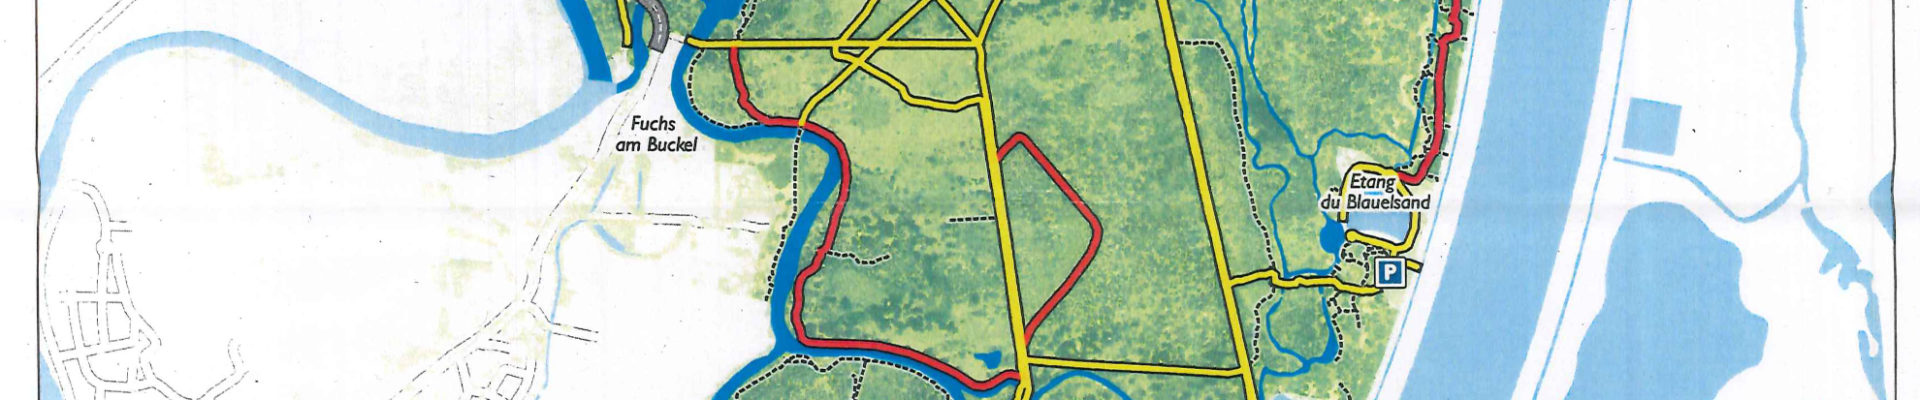 Charalose du frêne : l'accès la forêt de la Robertsau restreint